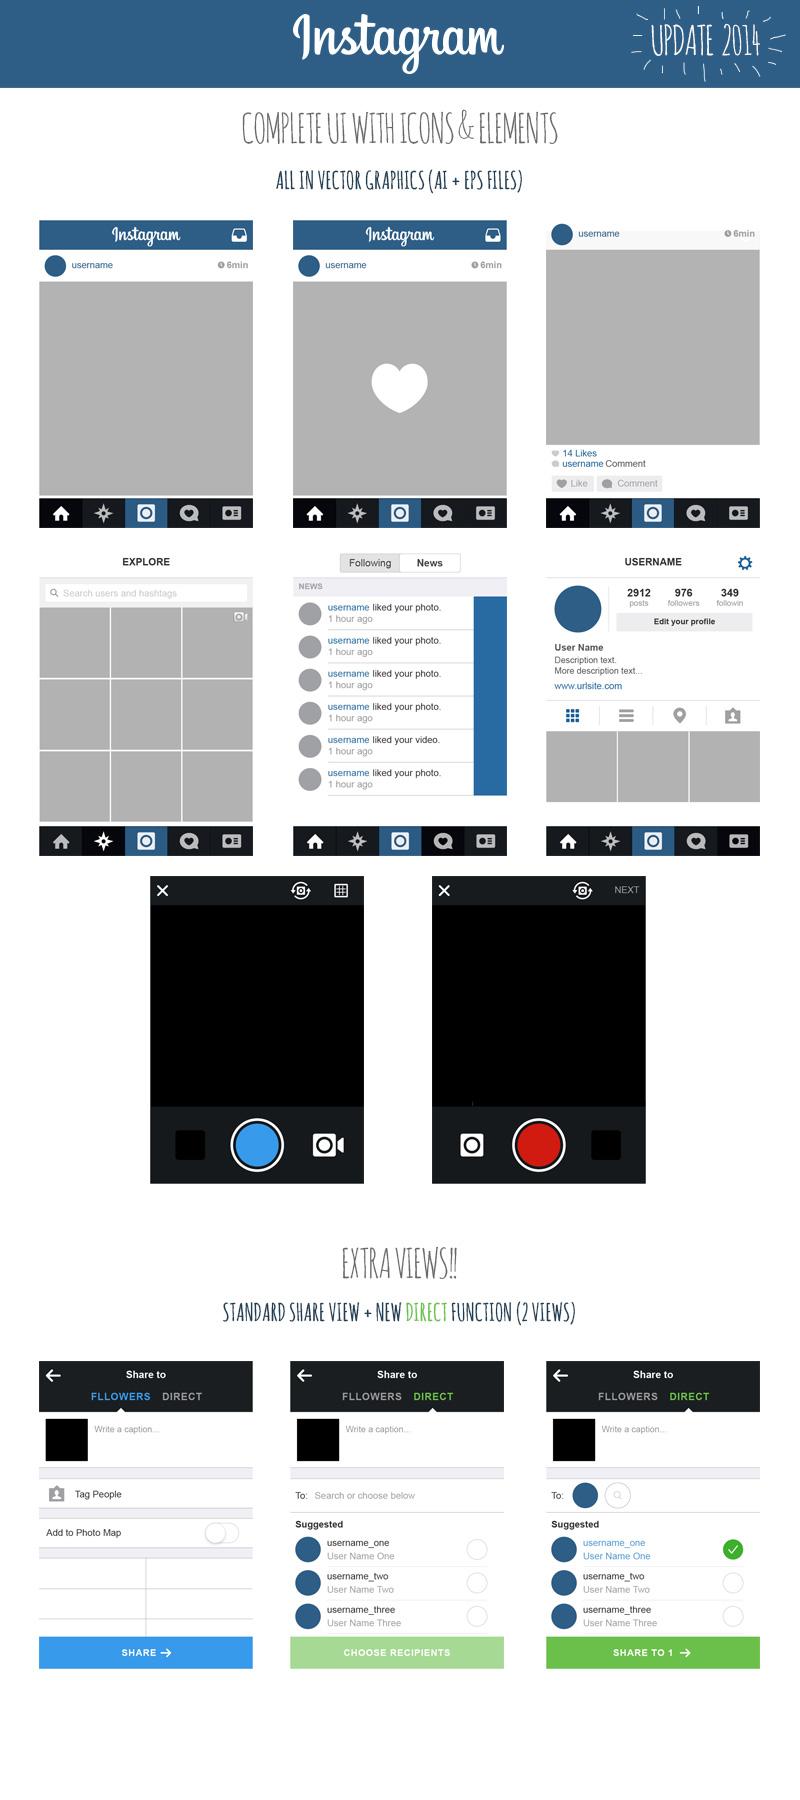 800x1800 Instagram User Interface